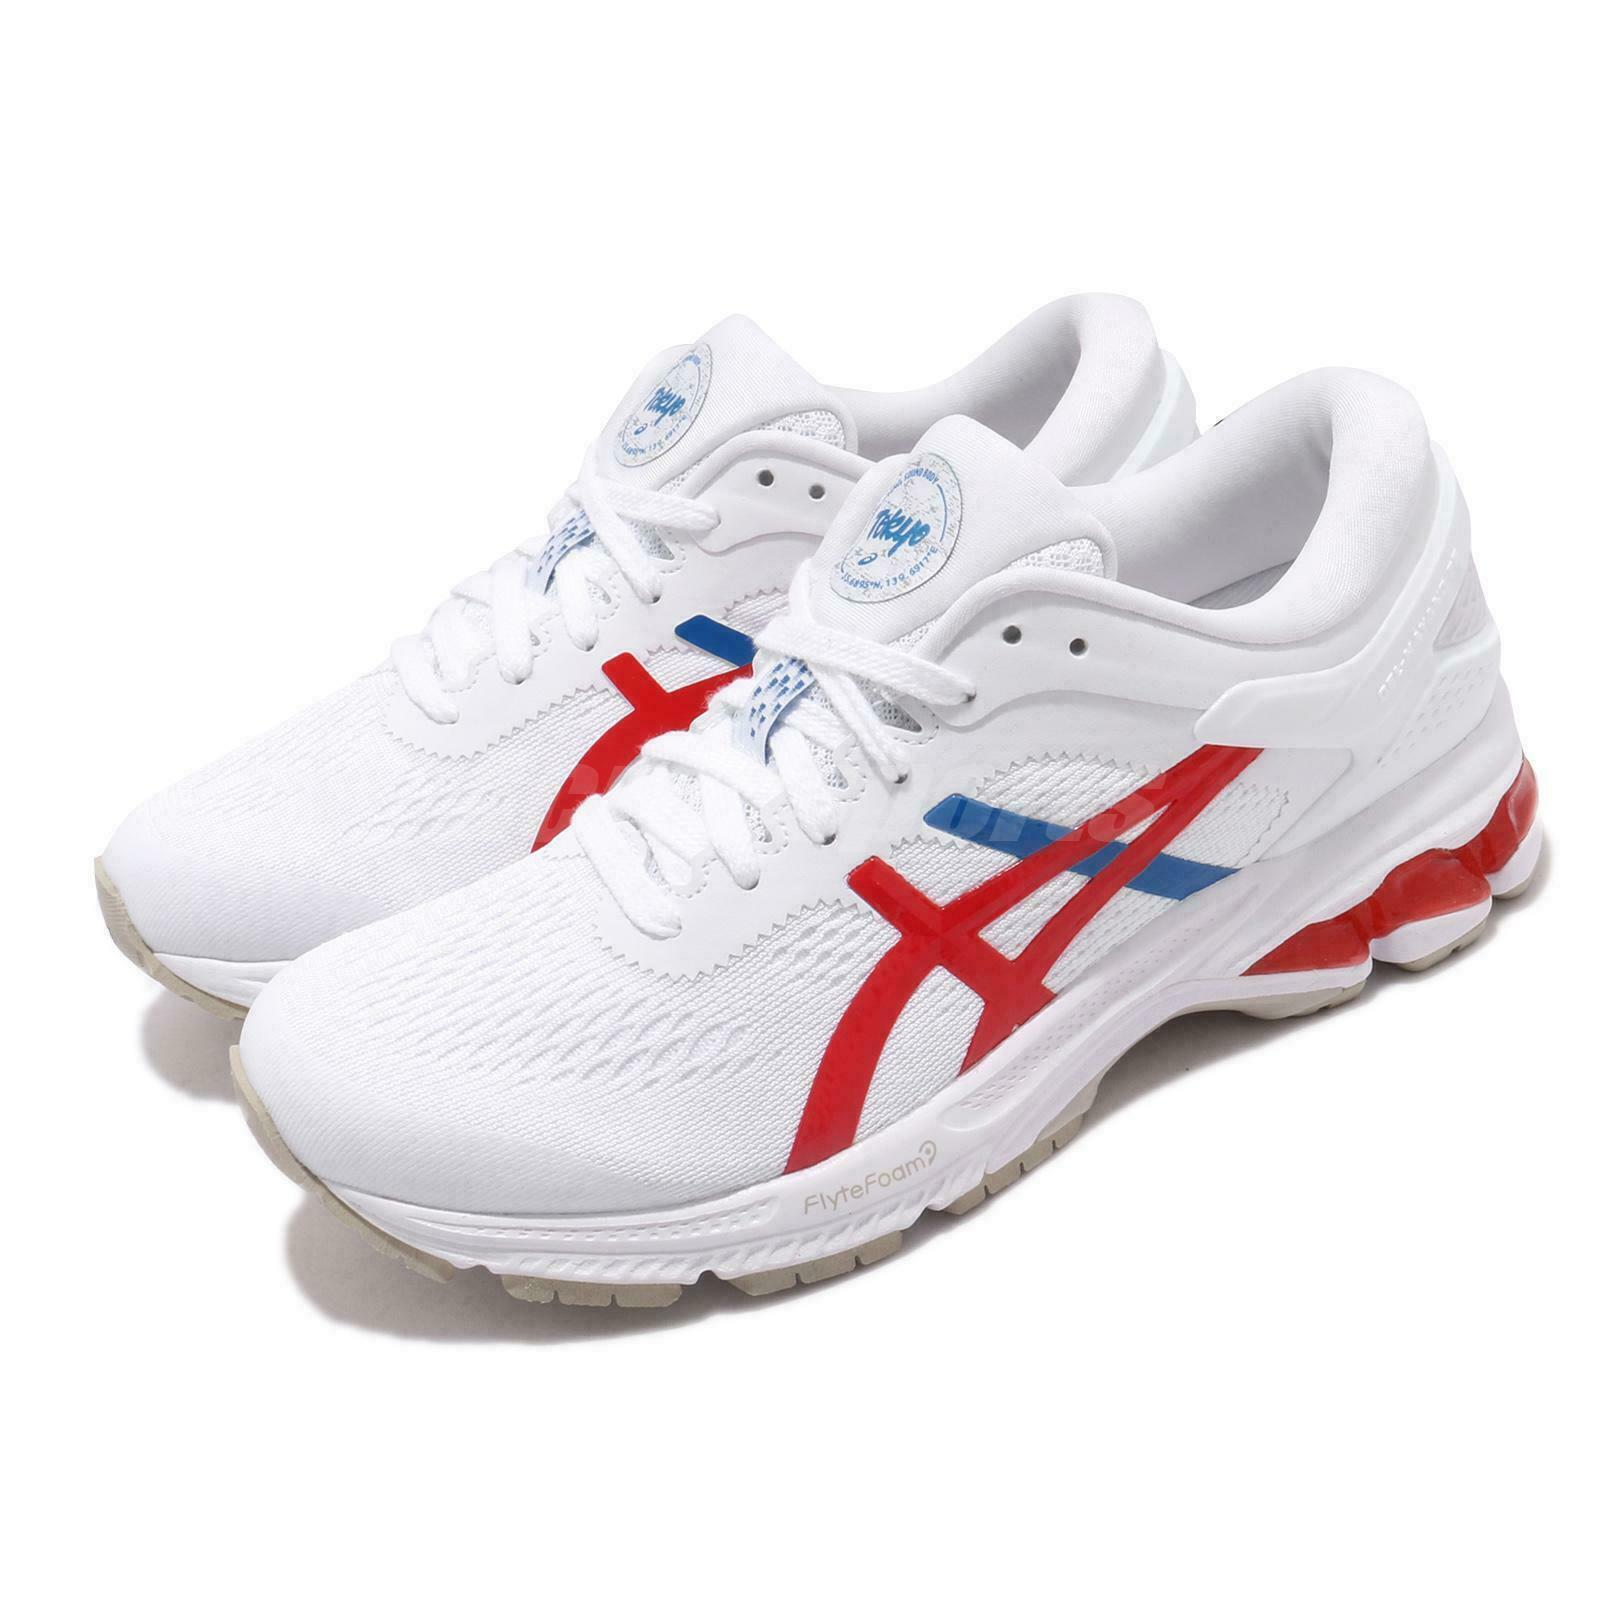 Size 11.5 - ASICS GEL-Kayano 27 White Peacoat